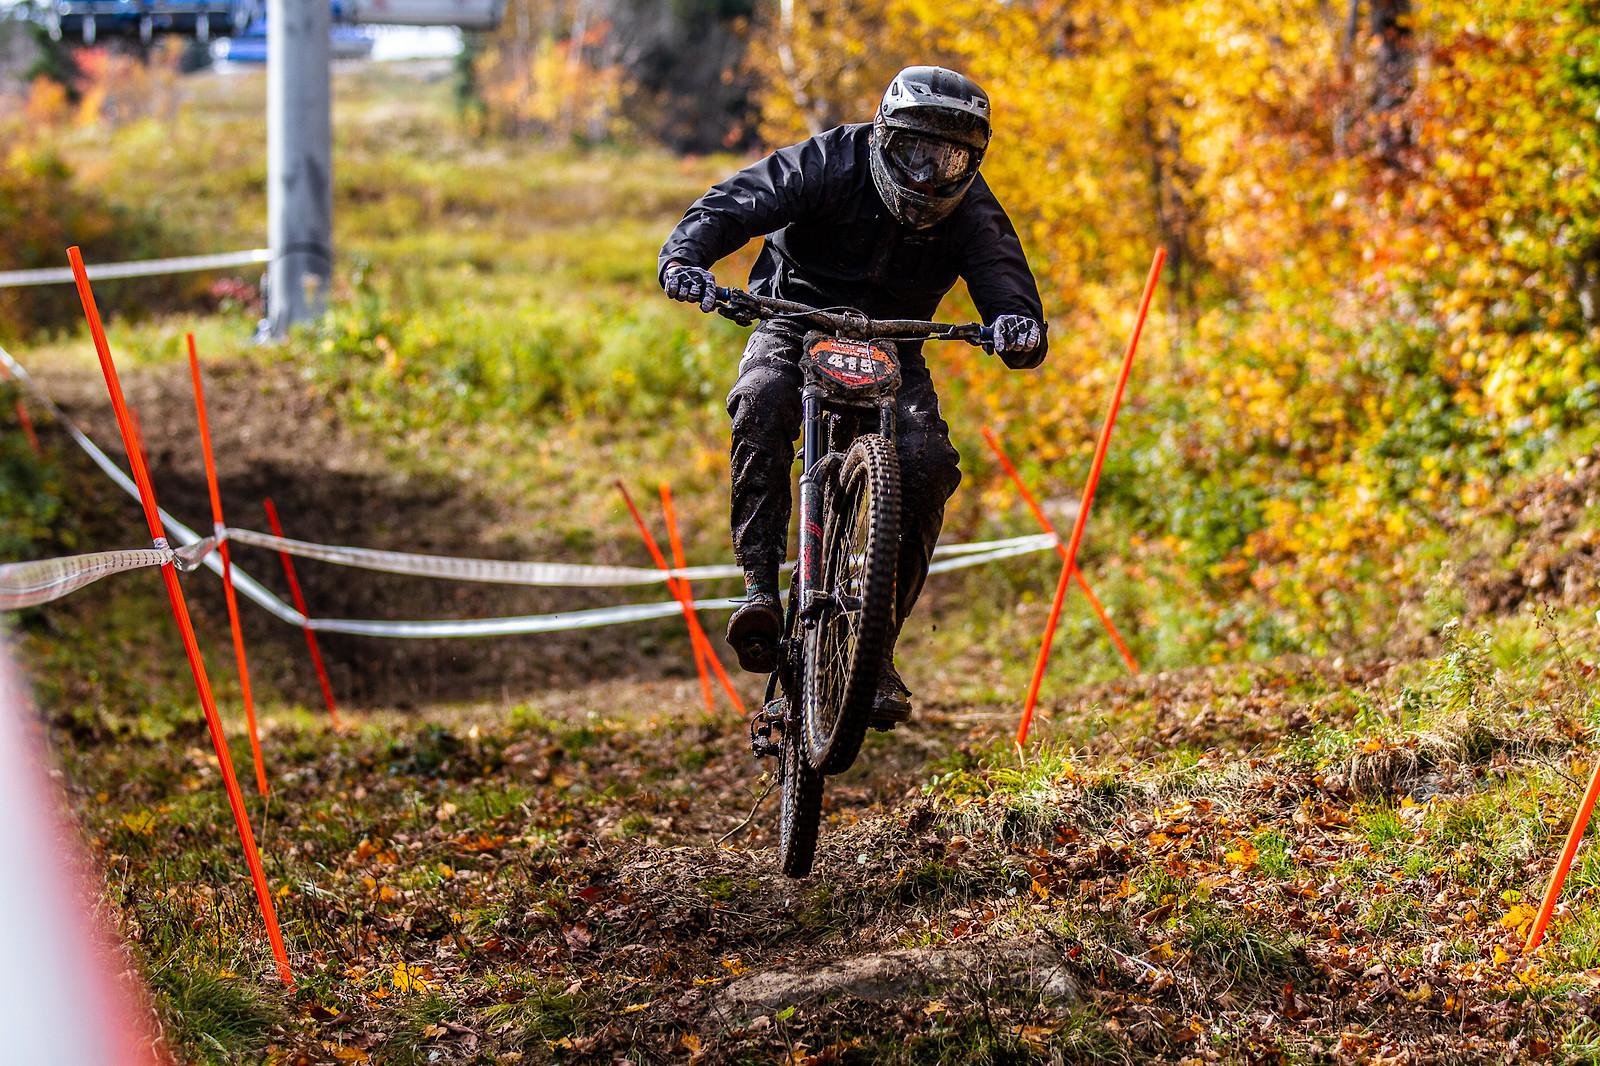 Raphael Paquet - JackRice - Mountain Biking Pictures - Vital MTB